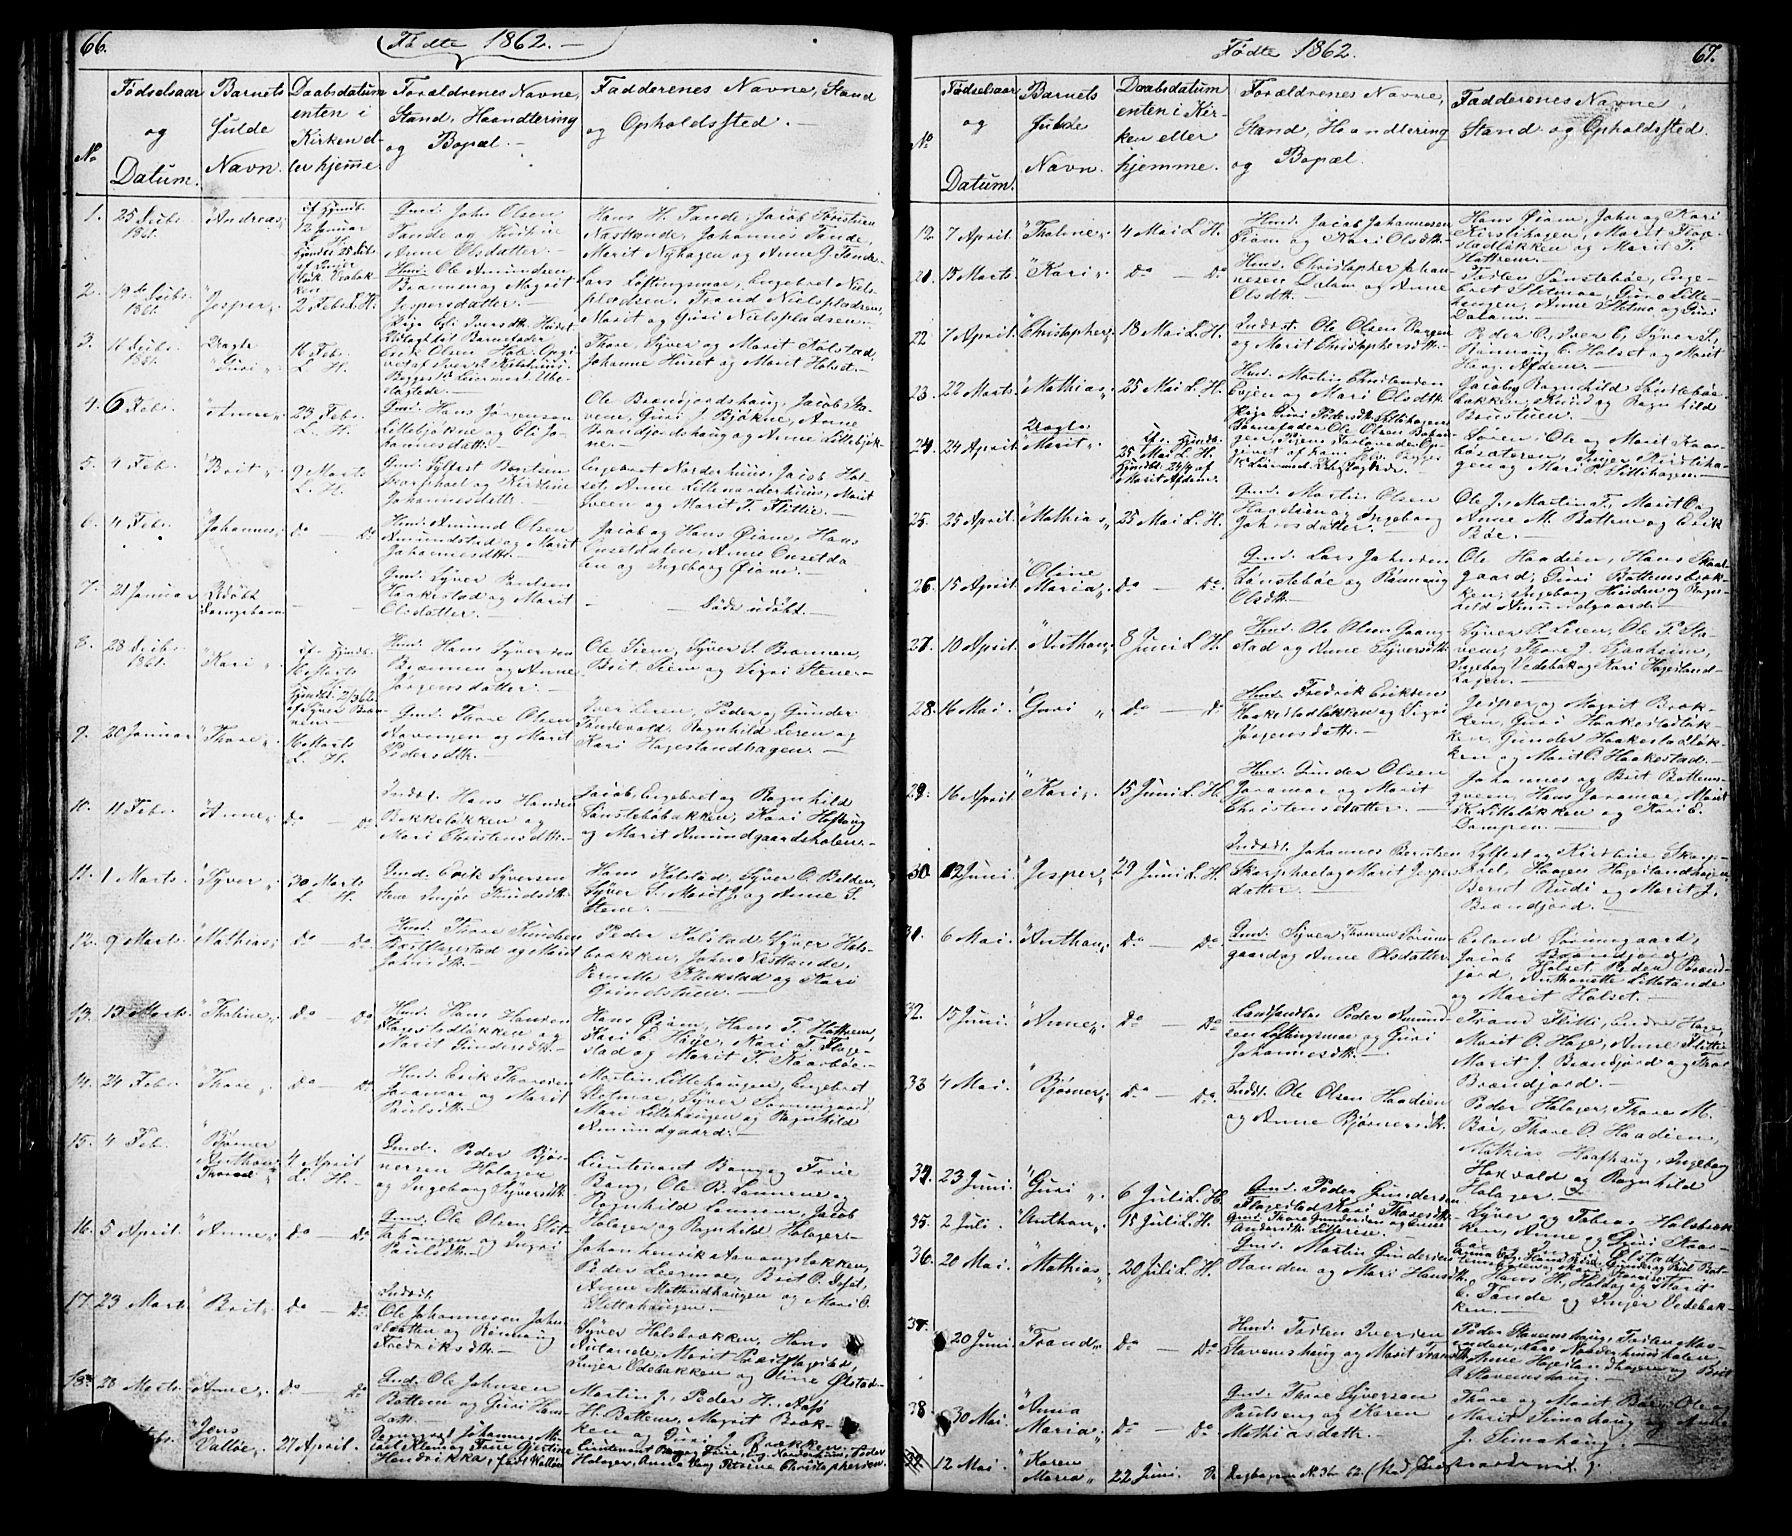 SAH, Lesja prestekontor, Klokkerbok nr. 5, 1850-1894, s. 66-67